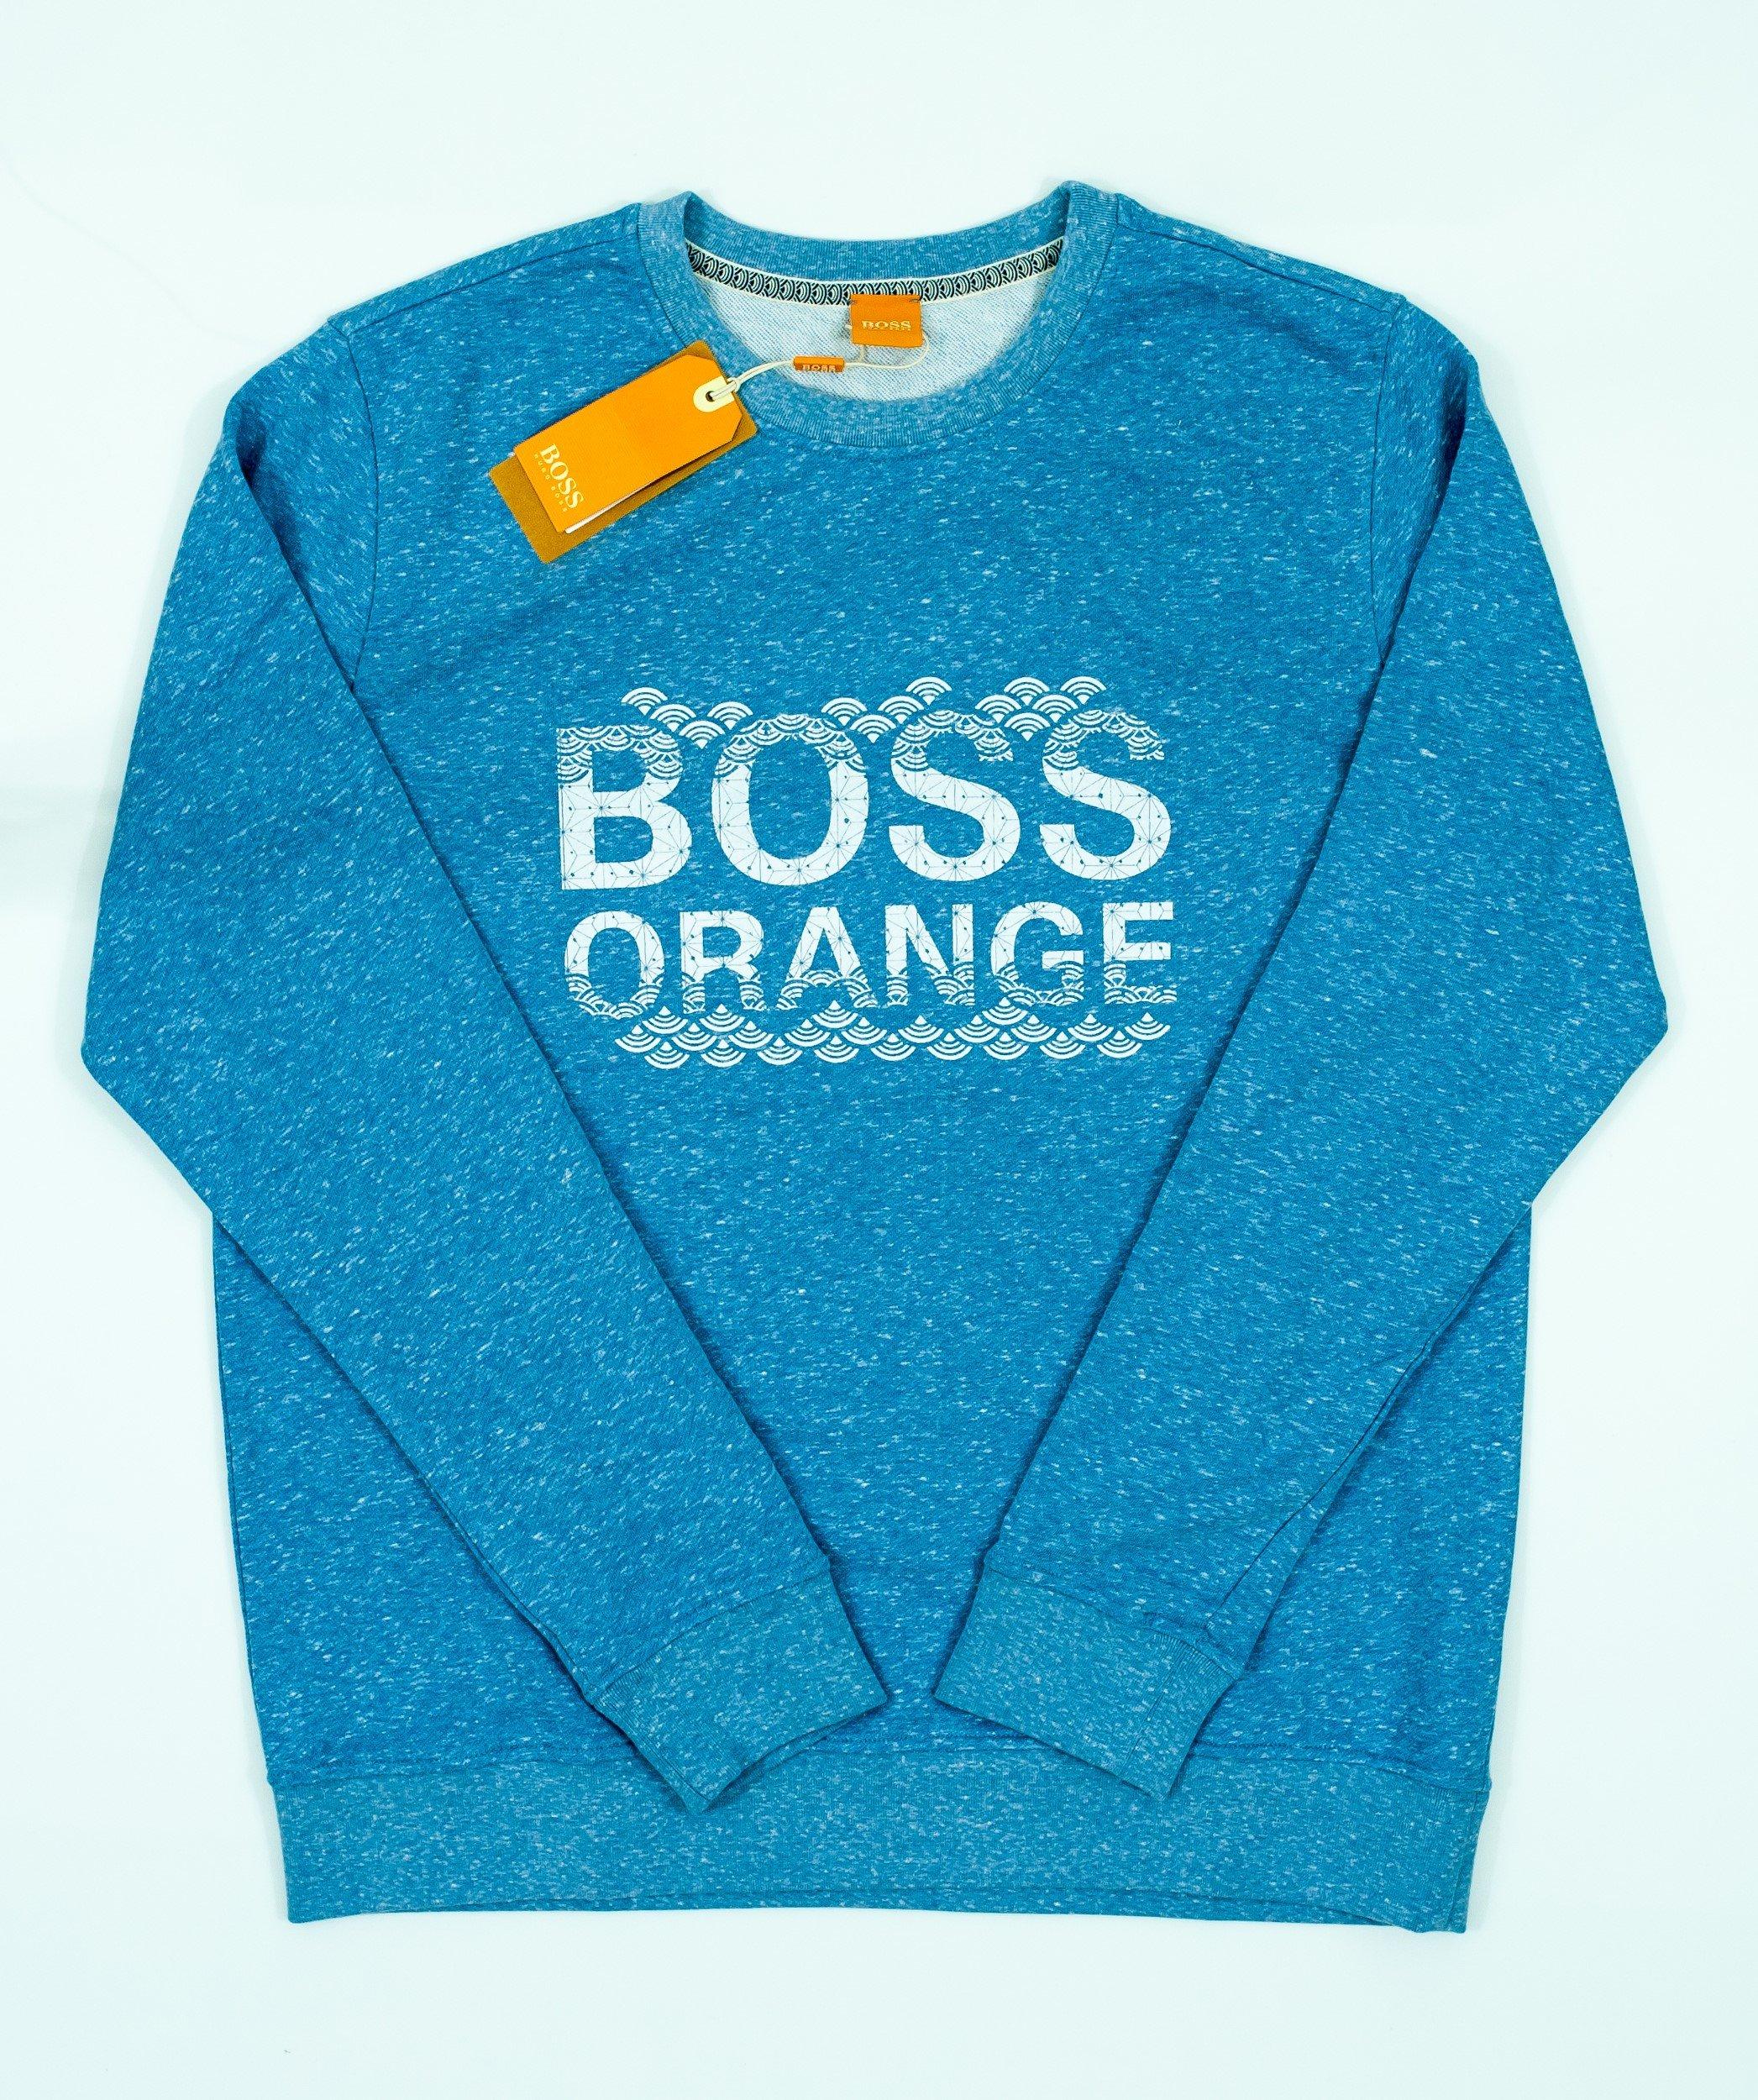 dc60da10dccaa Hugo Boss Orange Bluza męska roz XL, mientus/Łódź - 7356378016 ...